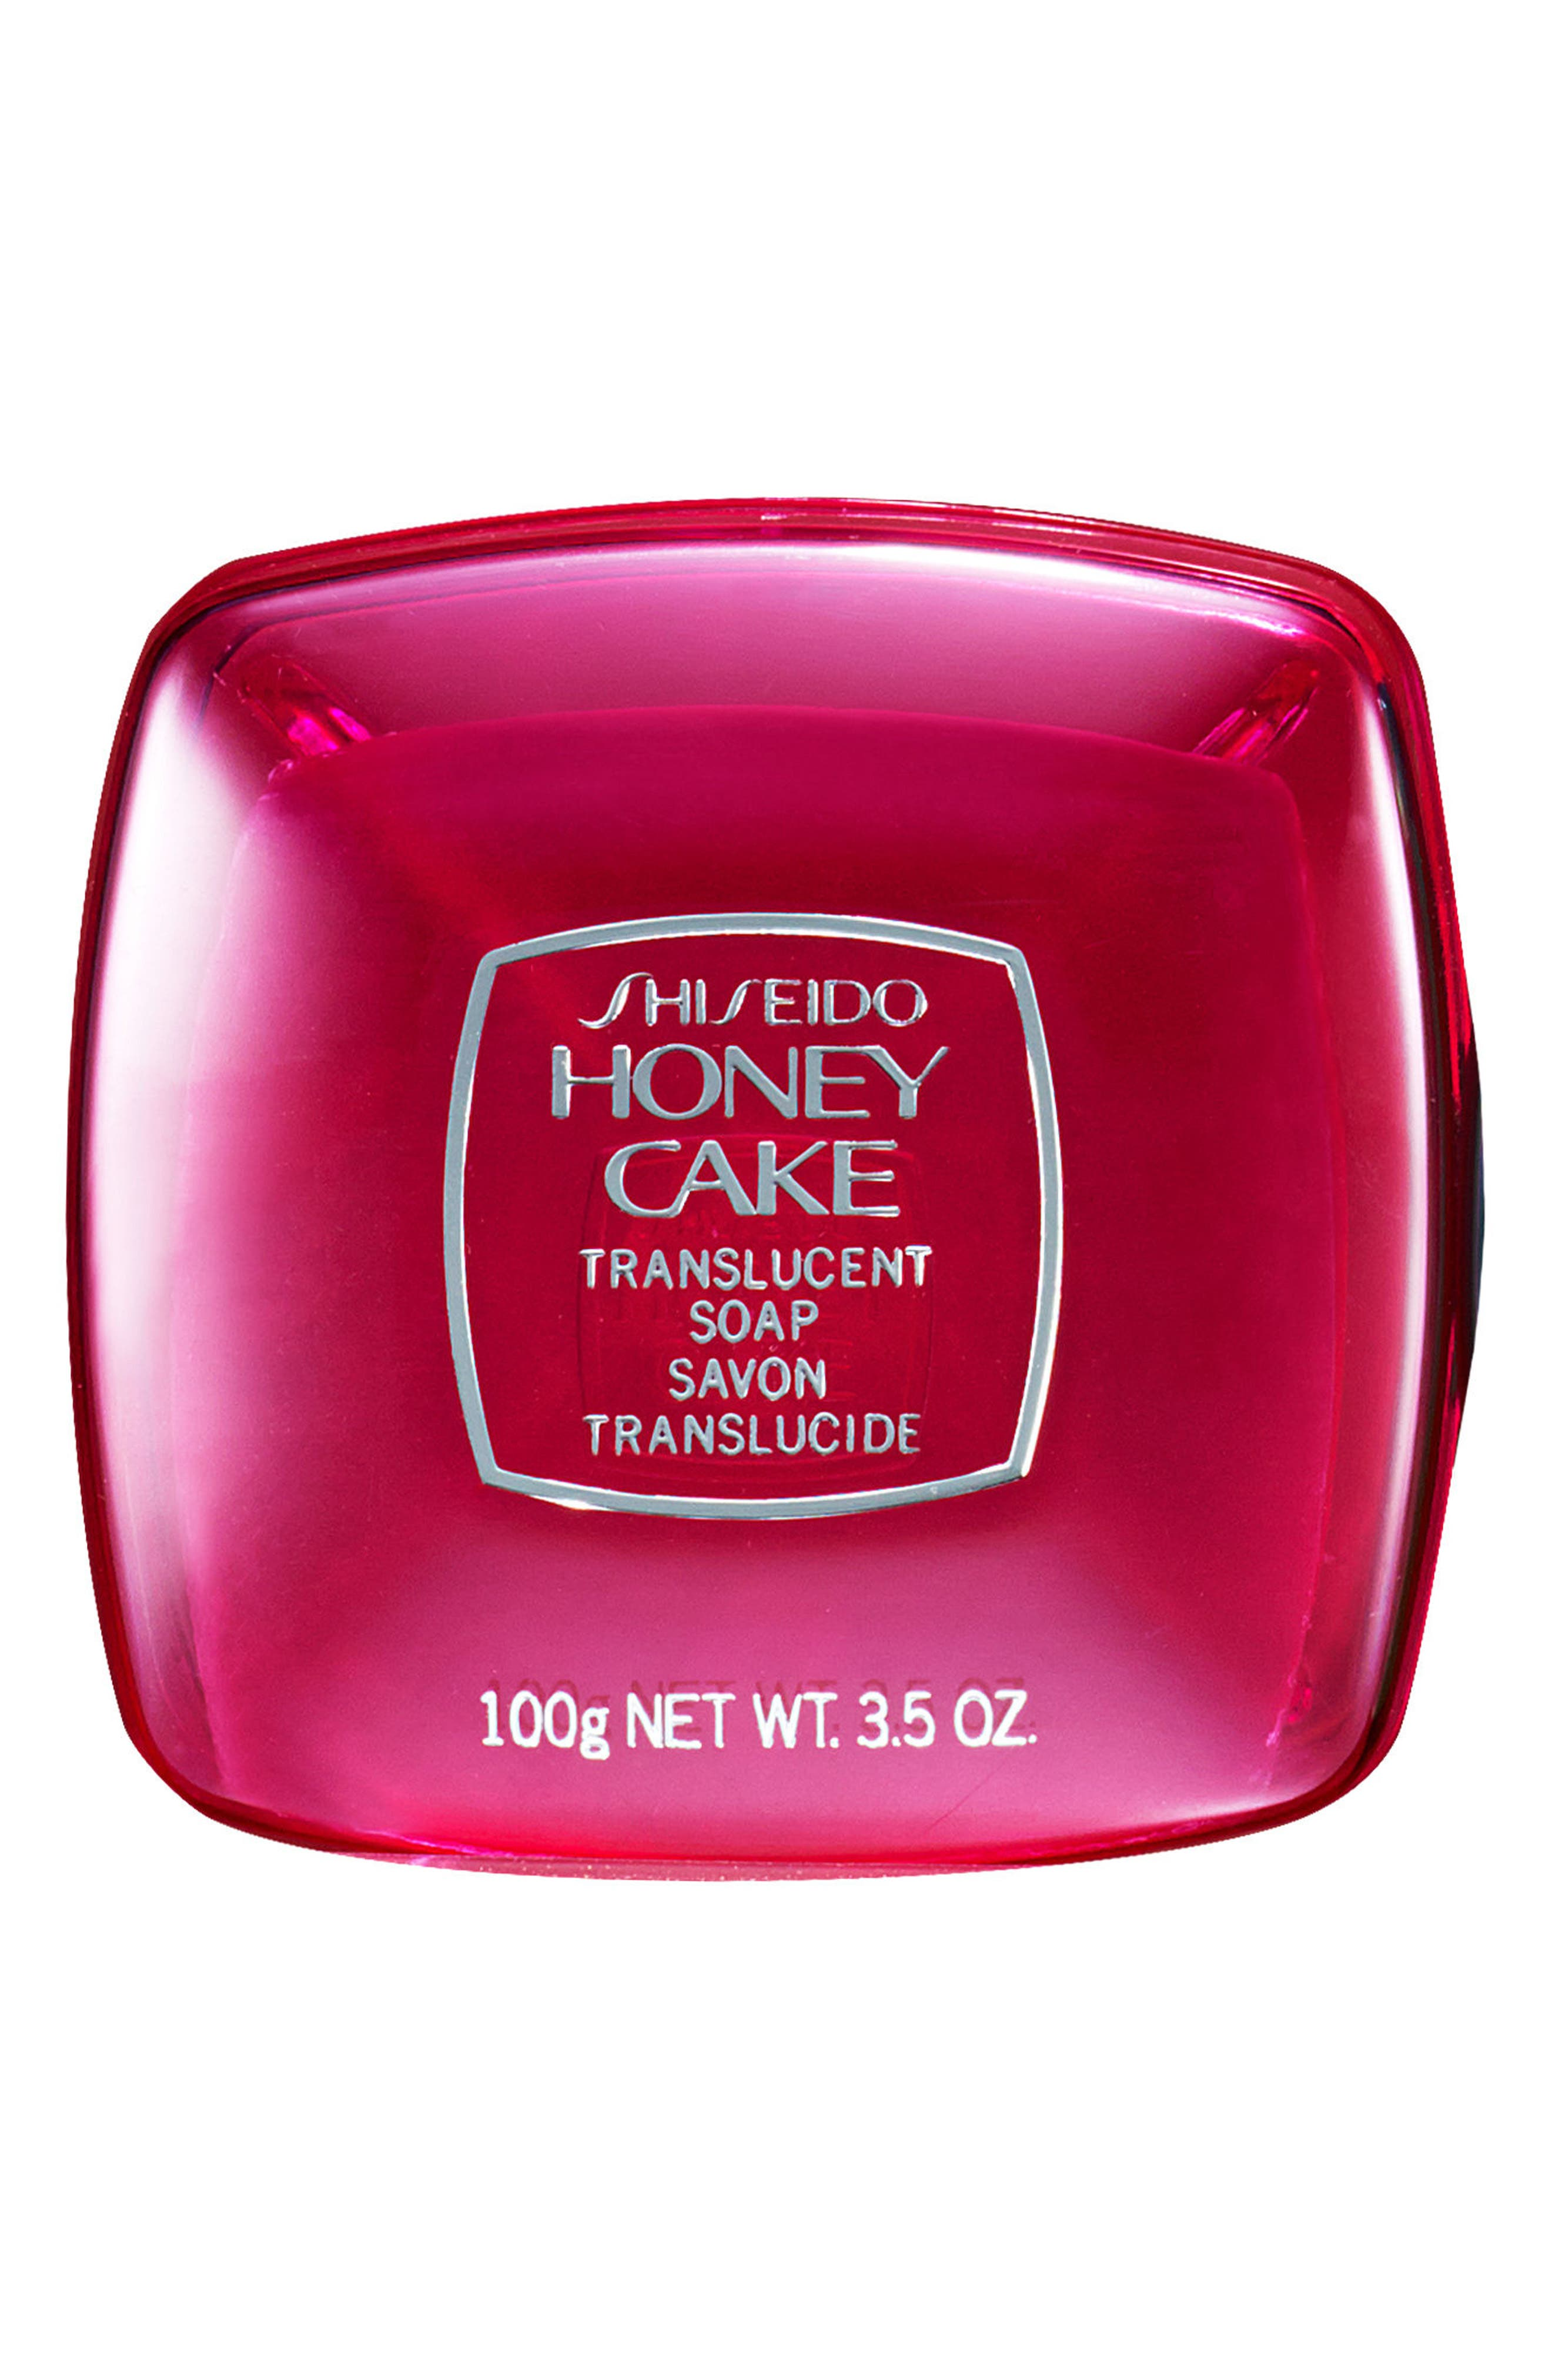 'Honey Cake' Translucent Soap,                             Main thumbnail 1, color,